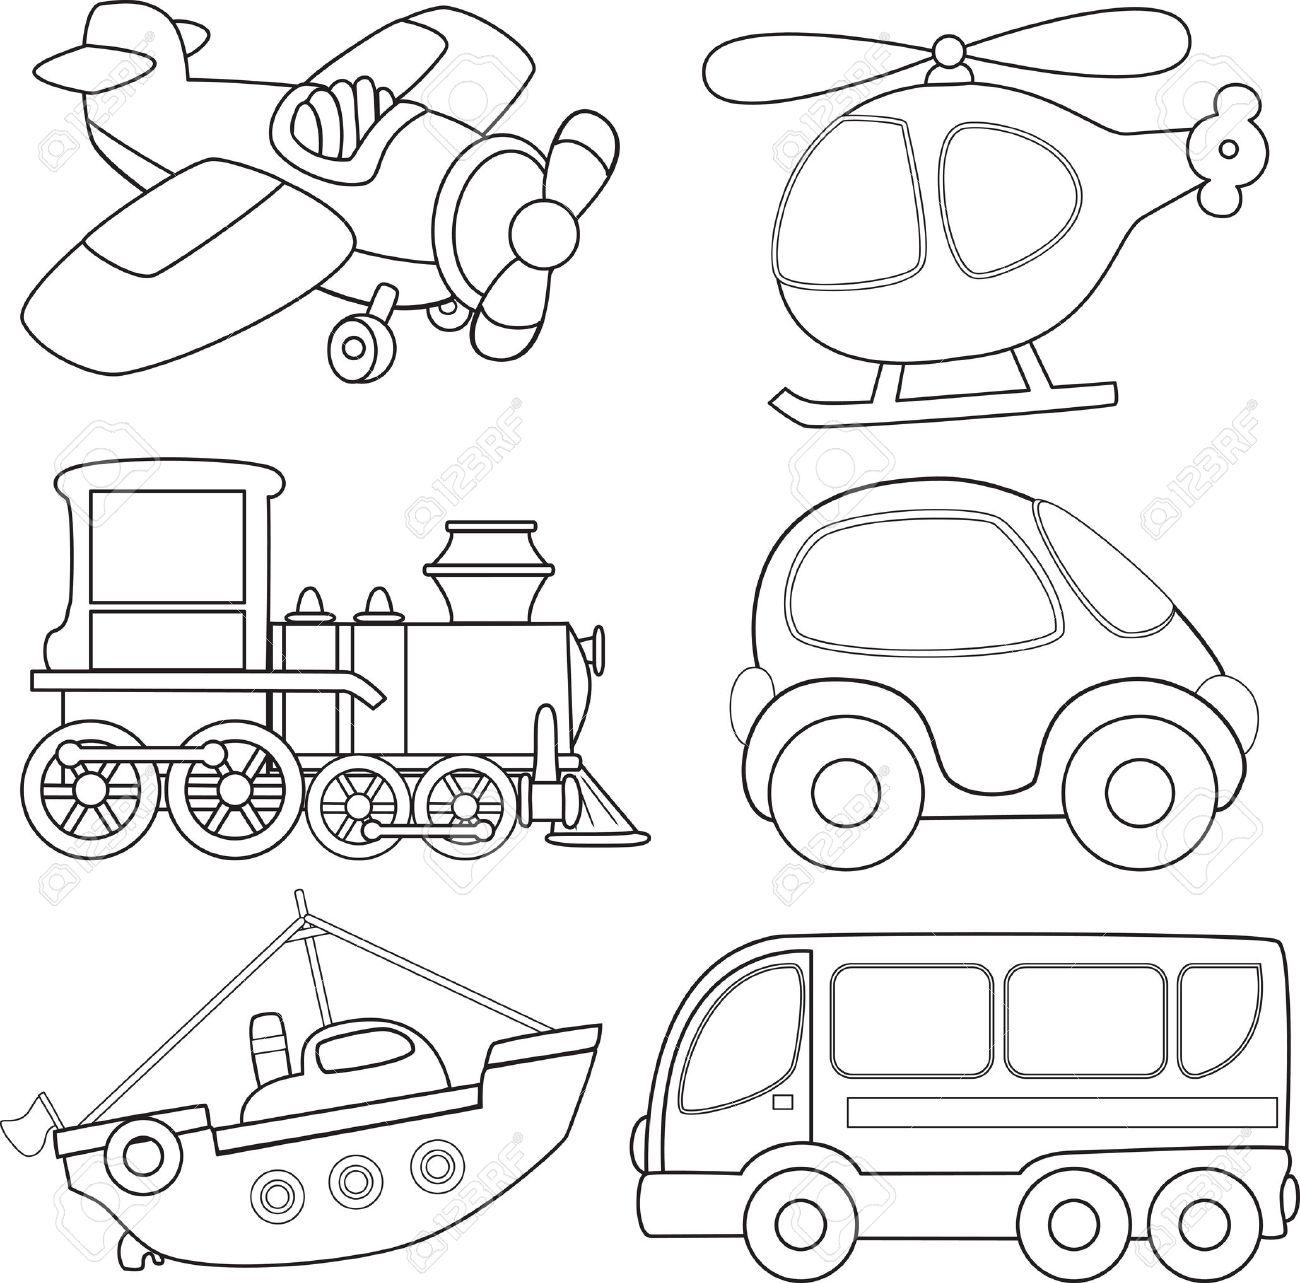 Раскраска транспорт - 7